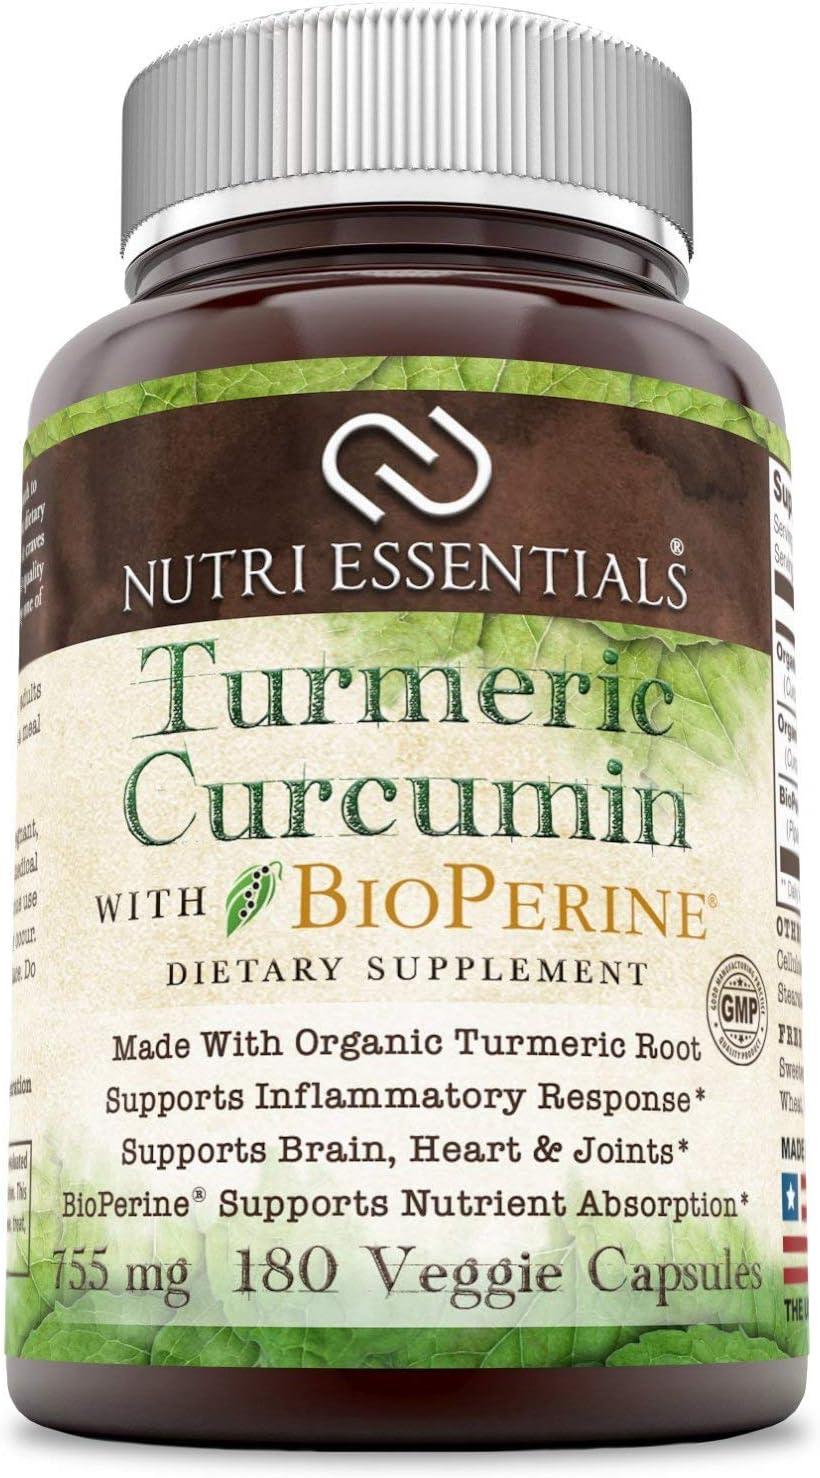 Nutri Essentials Organic Turmeric Indefinitely Curcumin Max 79% OFF Bioperine Mg 755 with